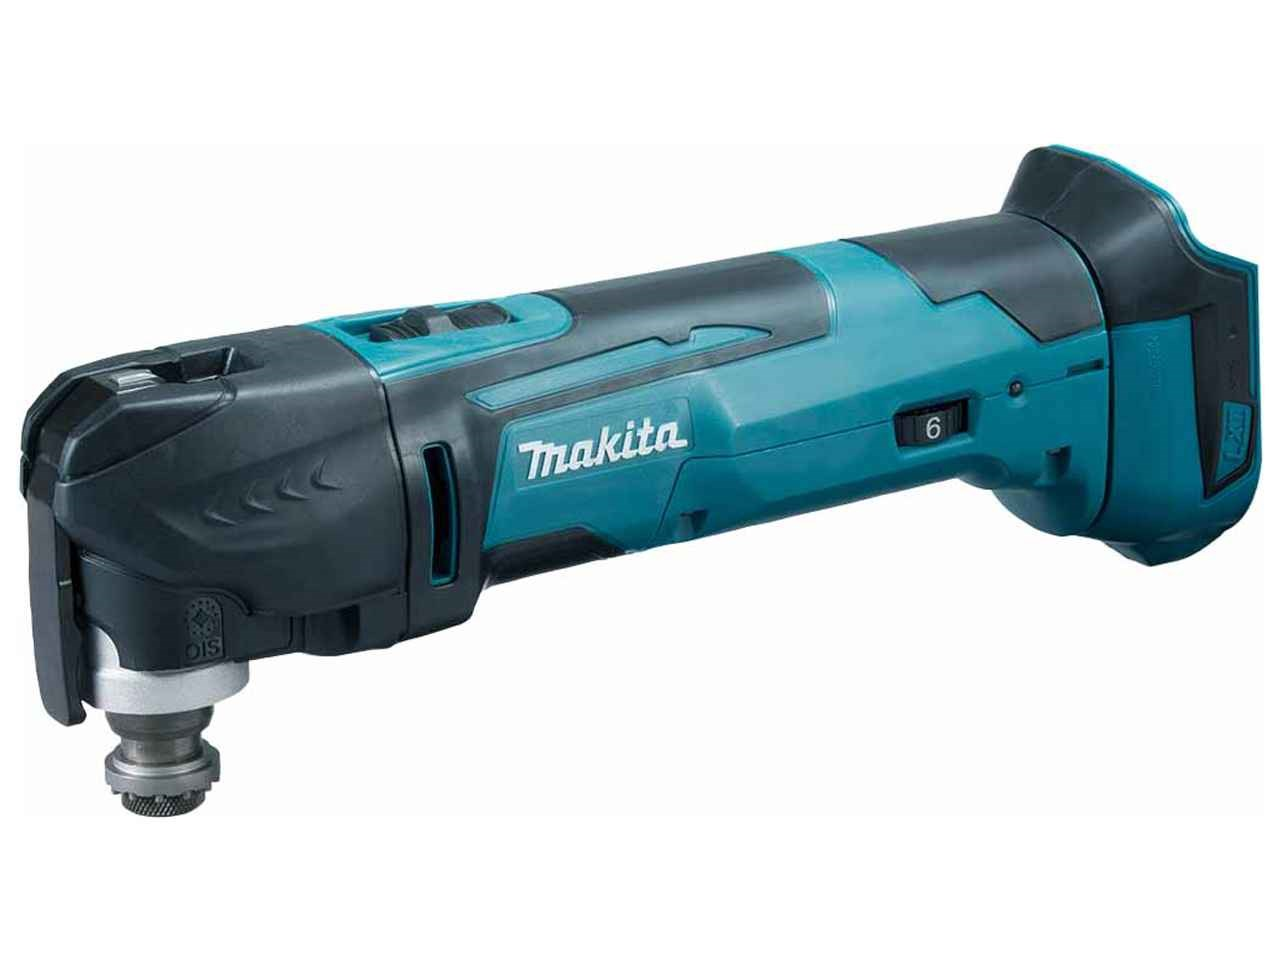 Makita dtm51z 18v lxt multi tool bare unit for Makita garden tools 18v